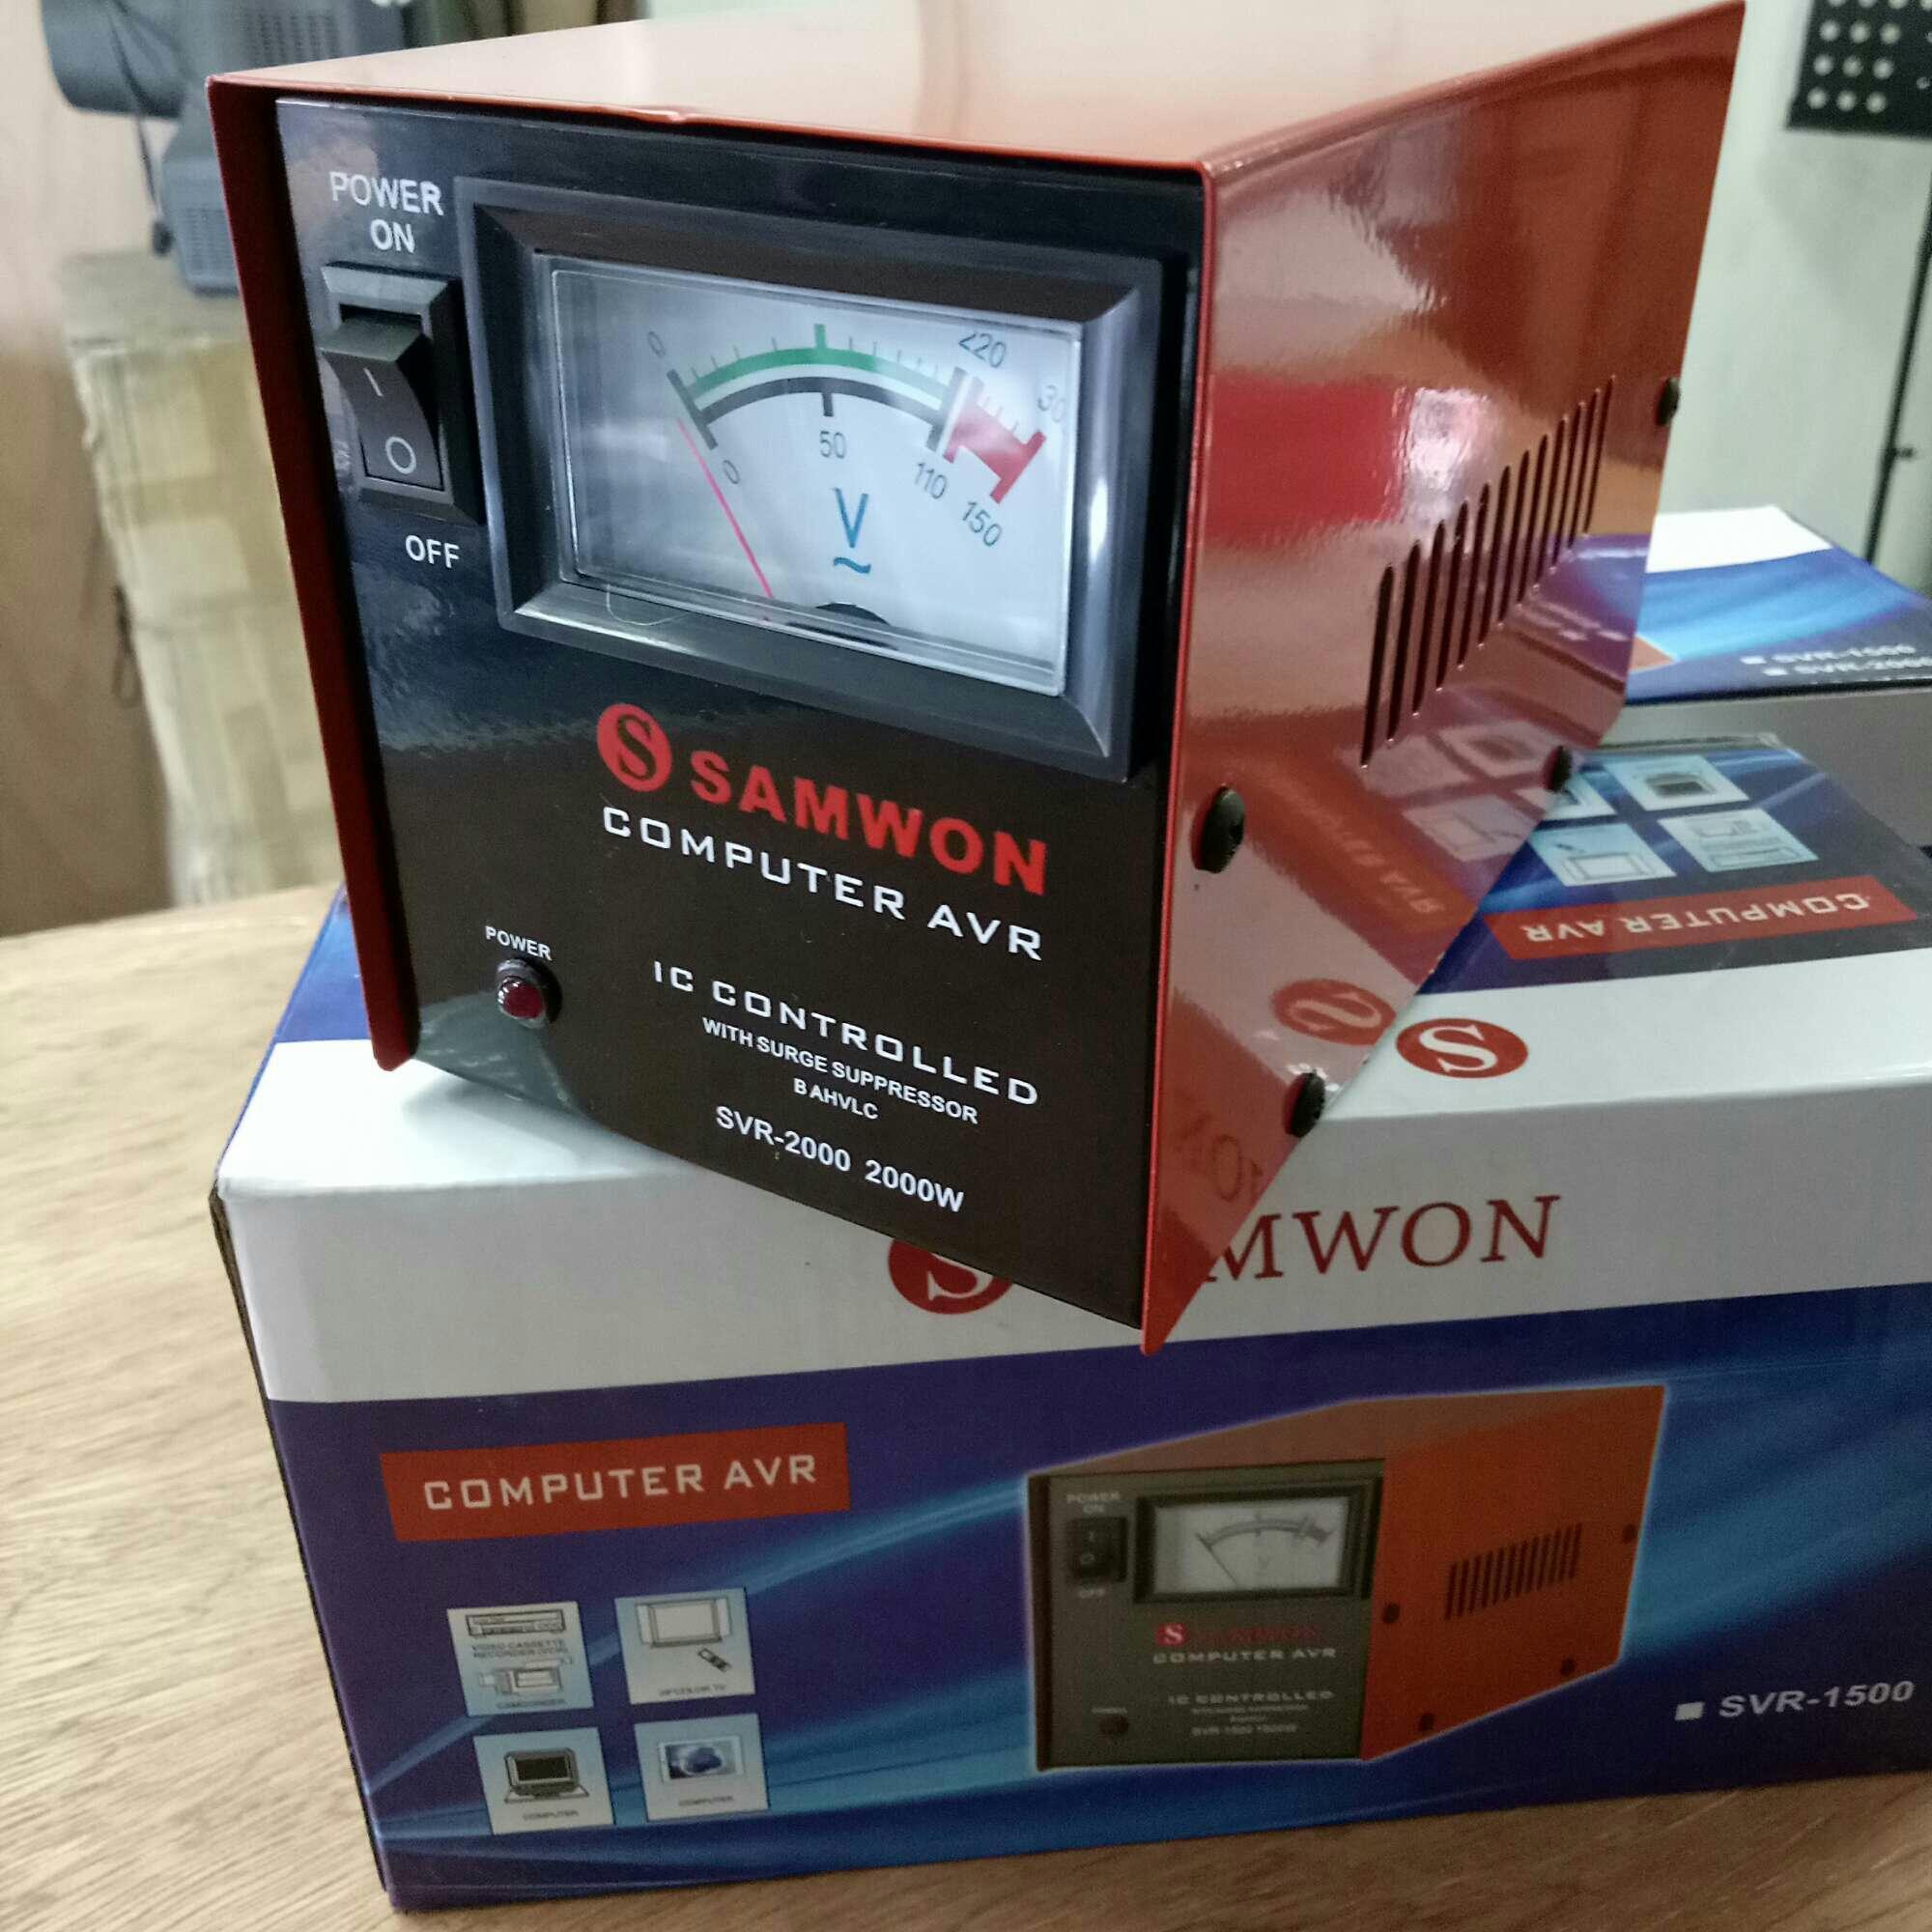 Pc Power Supply For Sale Computer Prices Brands Fsp Ups Ep 1000va Avr Samwon 2000 Watts Svr